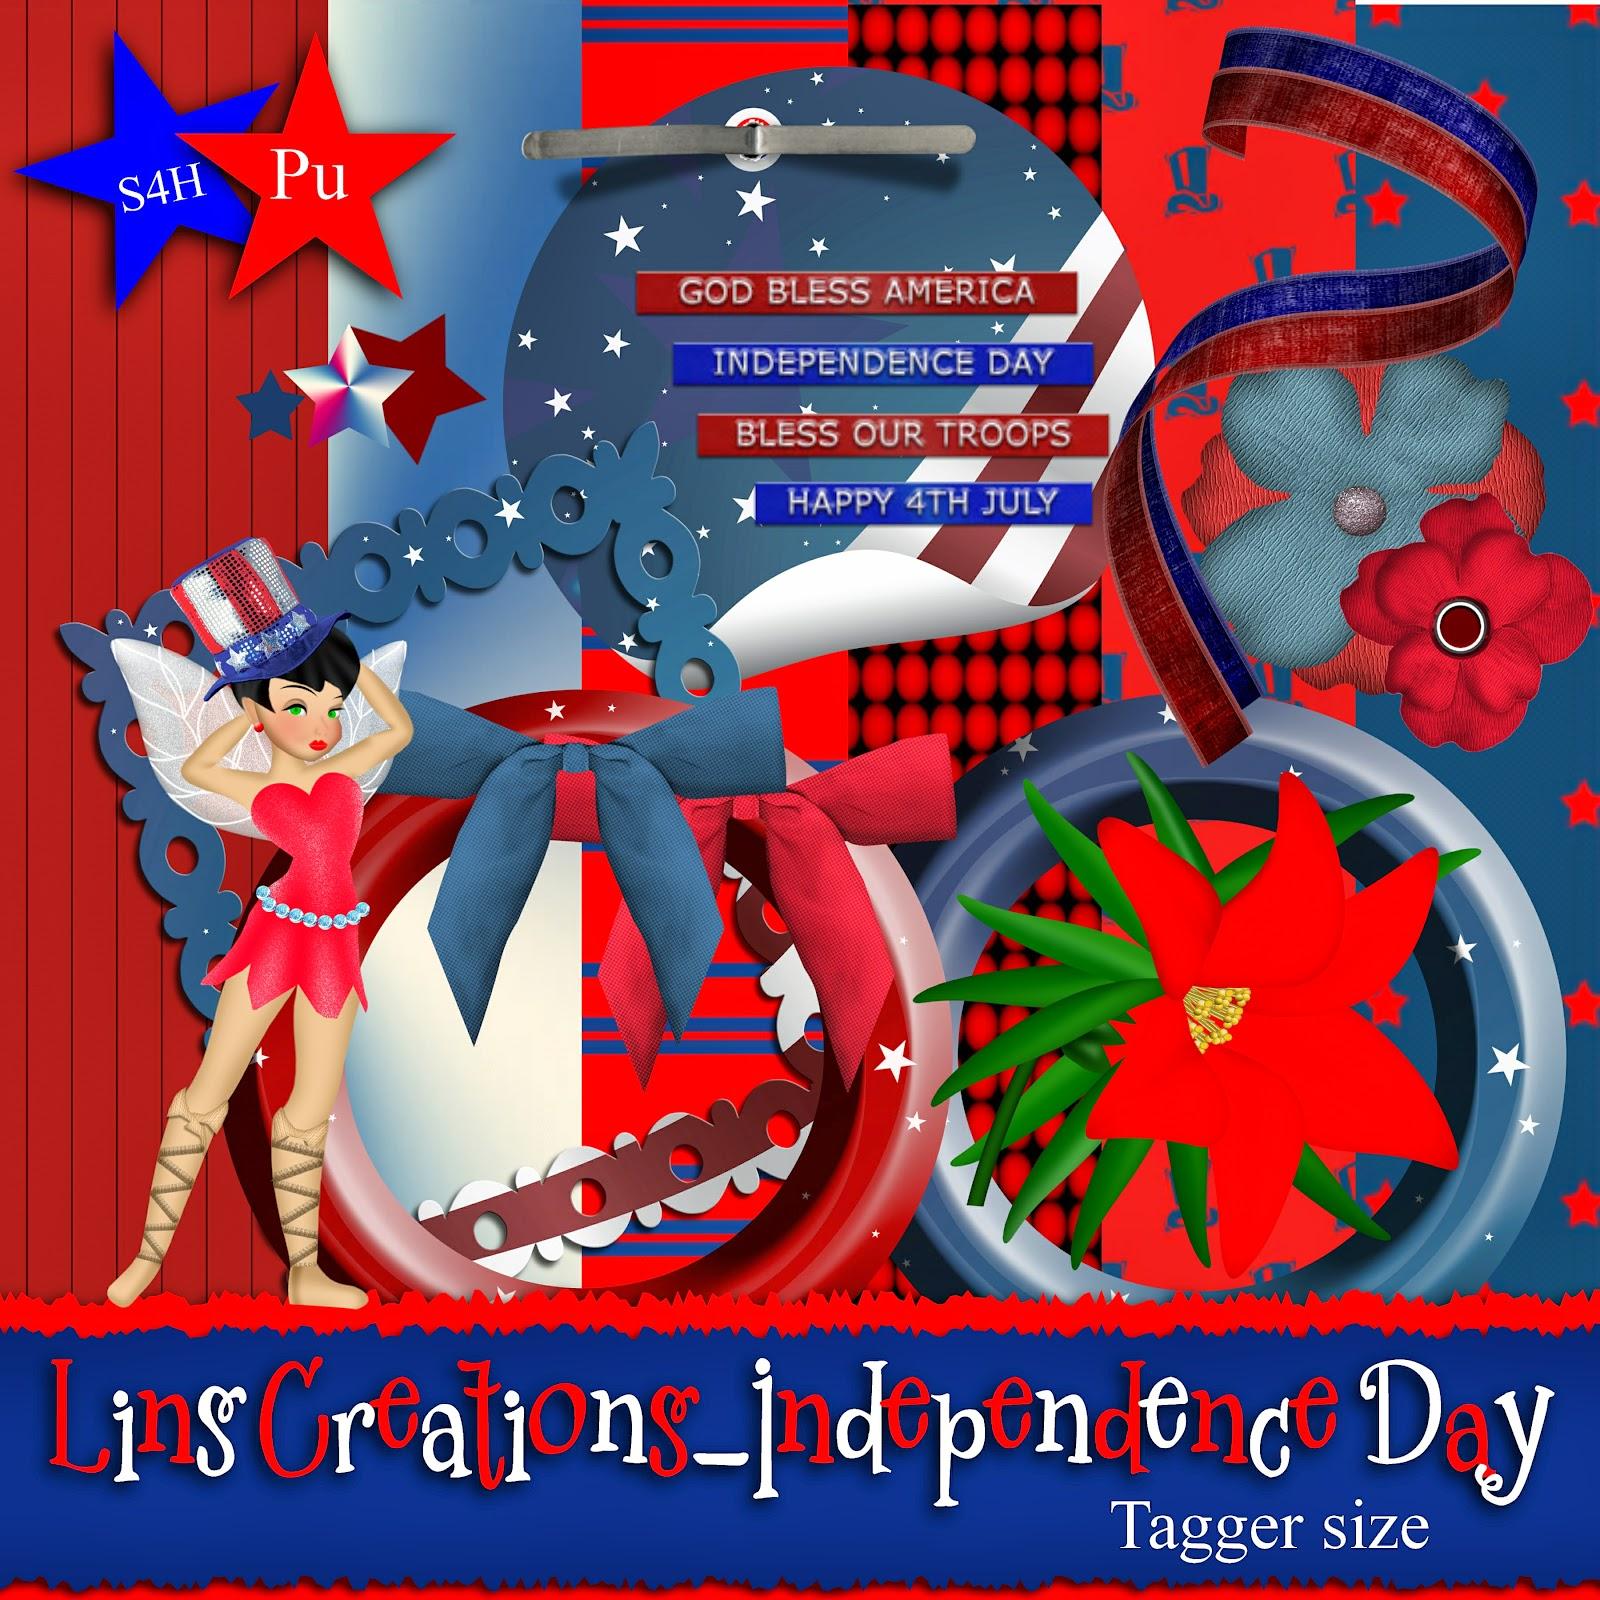 http://2.bp.blogspot.com/-HuytiktsXms/TgYfR4JFbyI/AAAAAAAAAxc/NND5aapNFmQ/s1600/ID.jpg